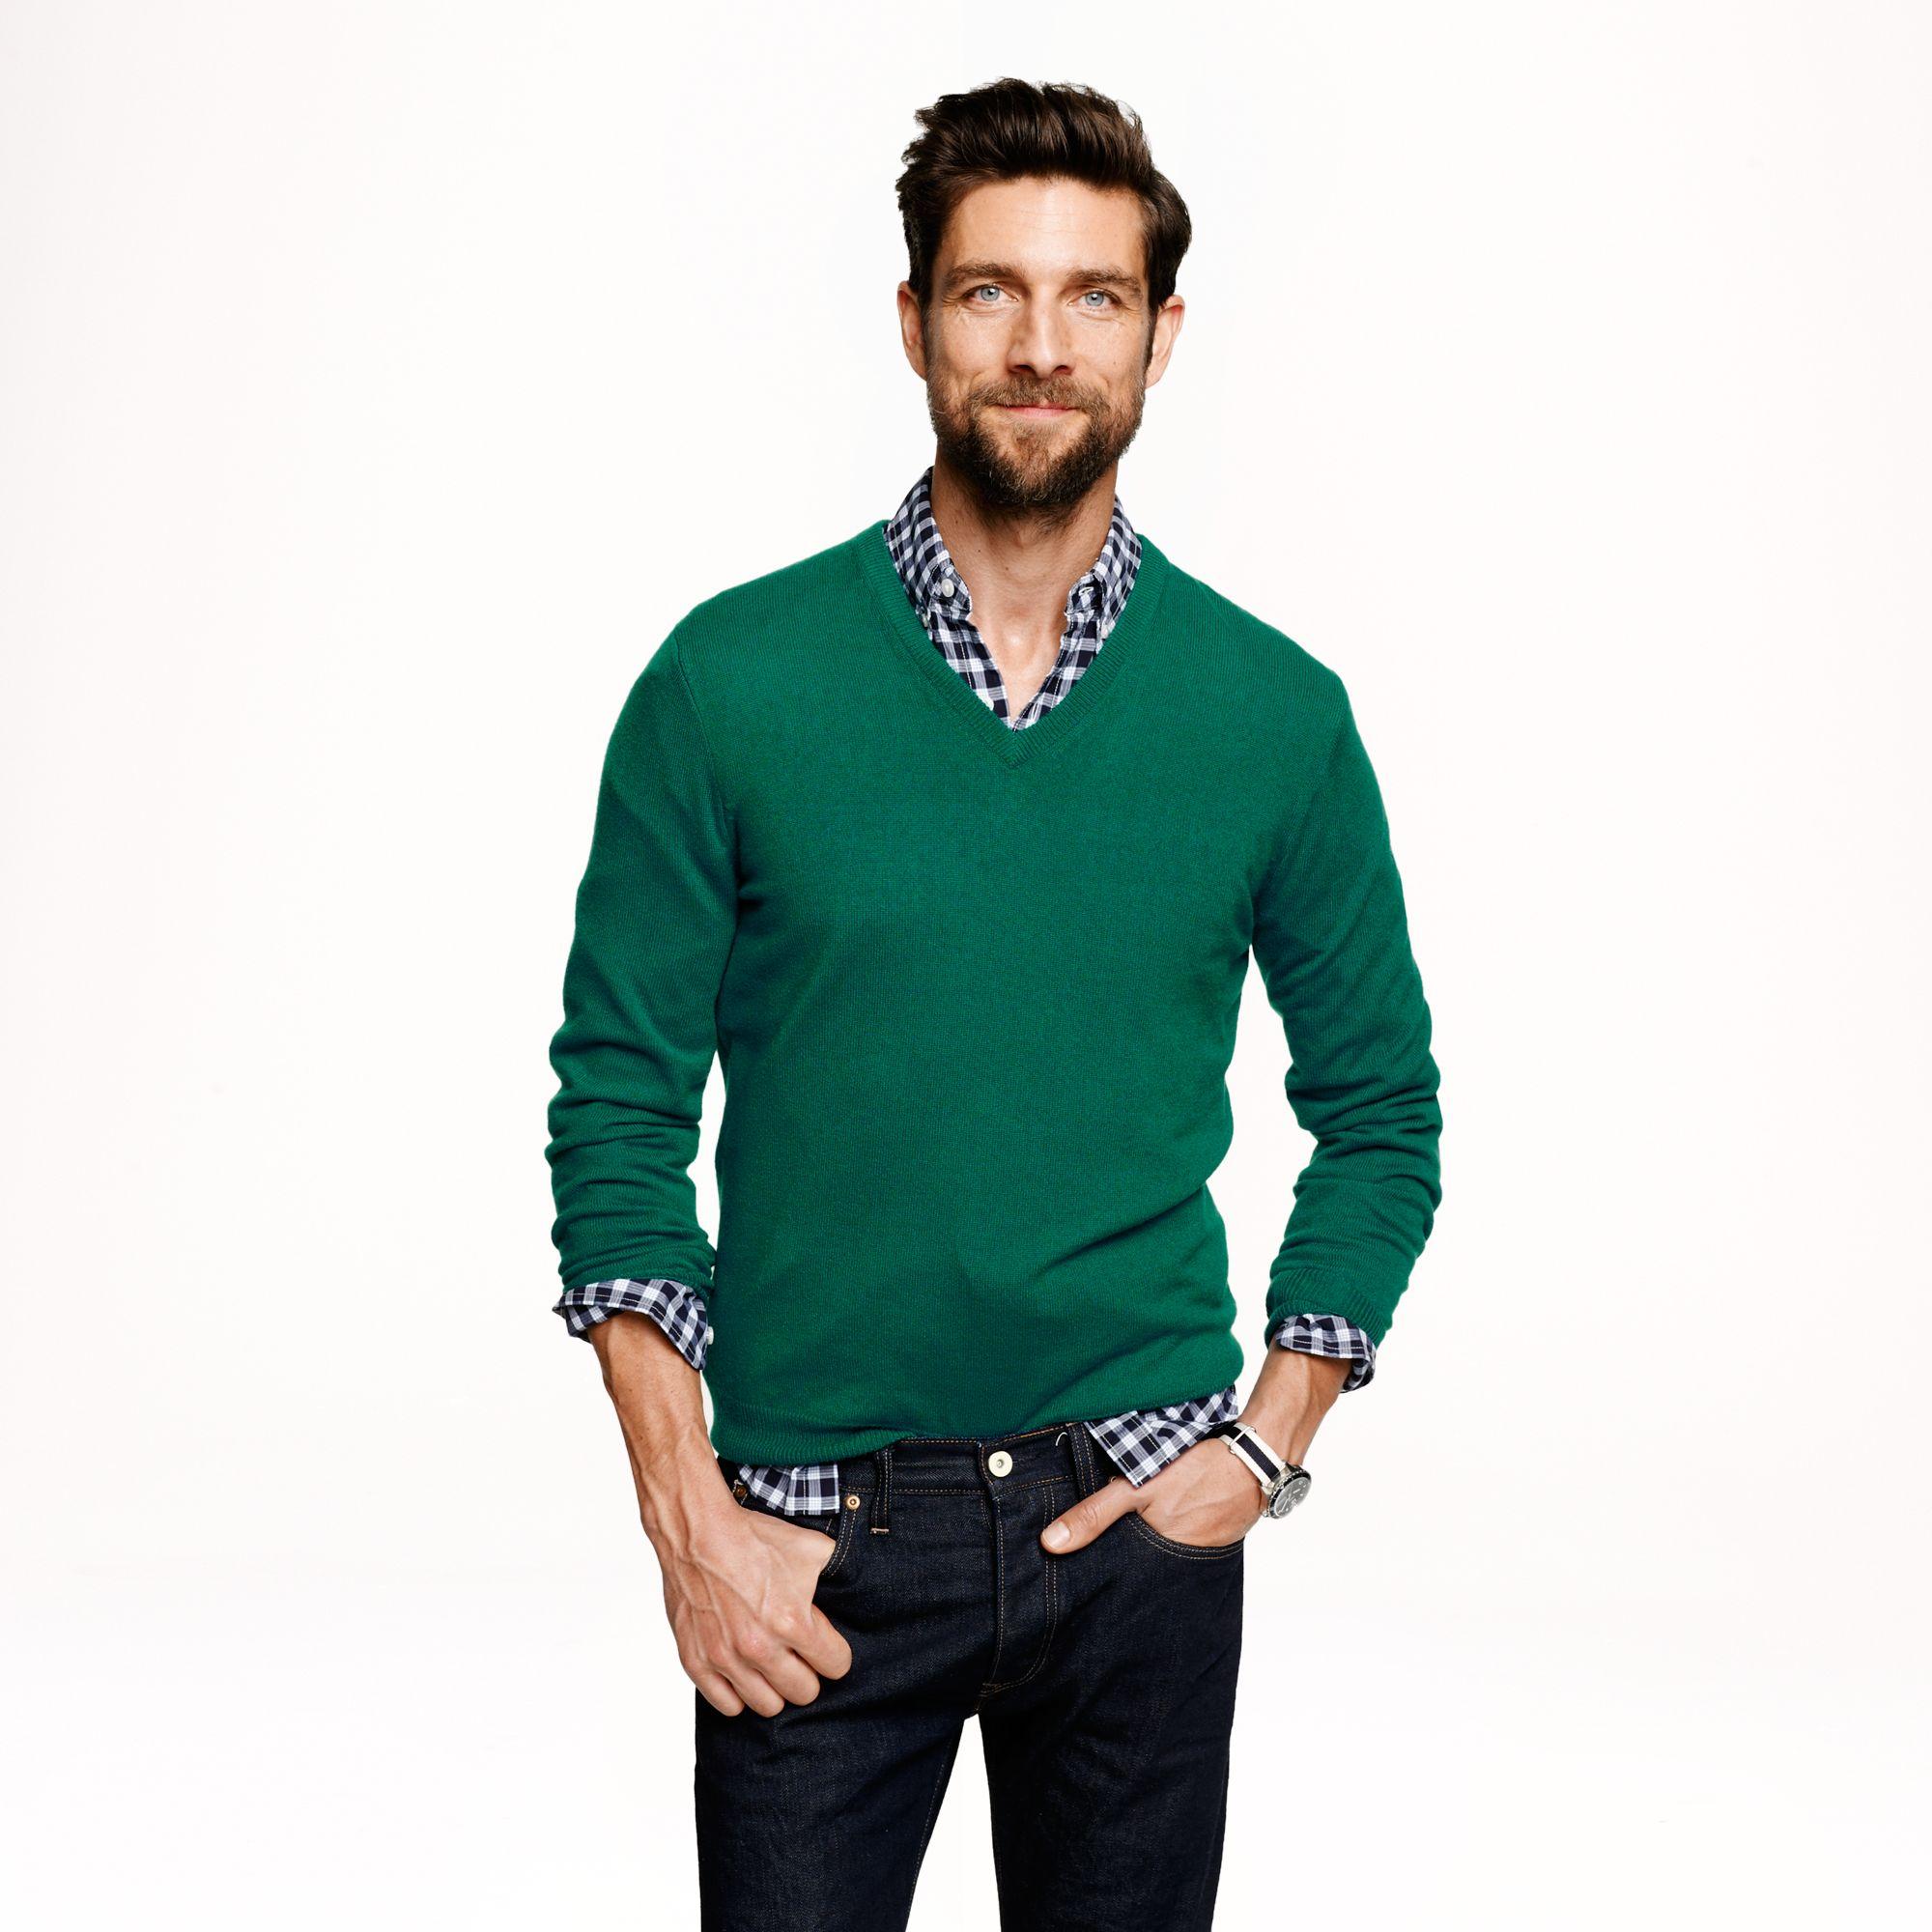 Green Cardigan Sweater Mens - Gray Cardigan Sweater